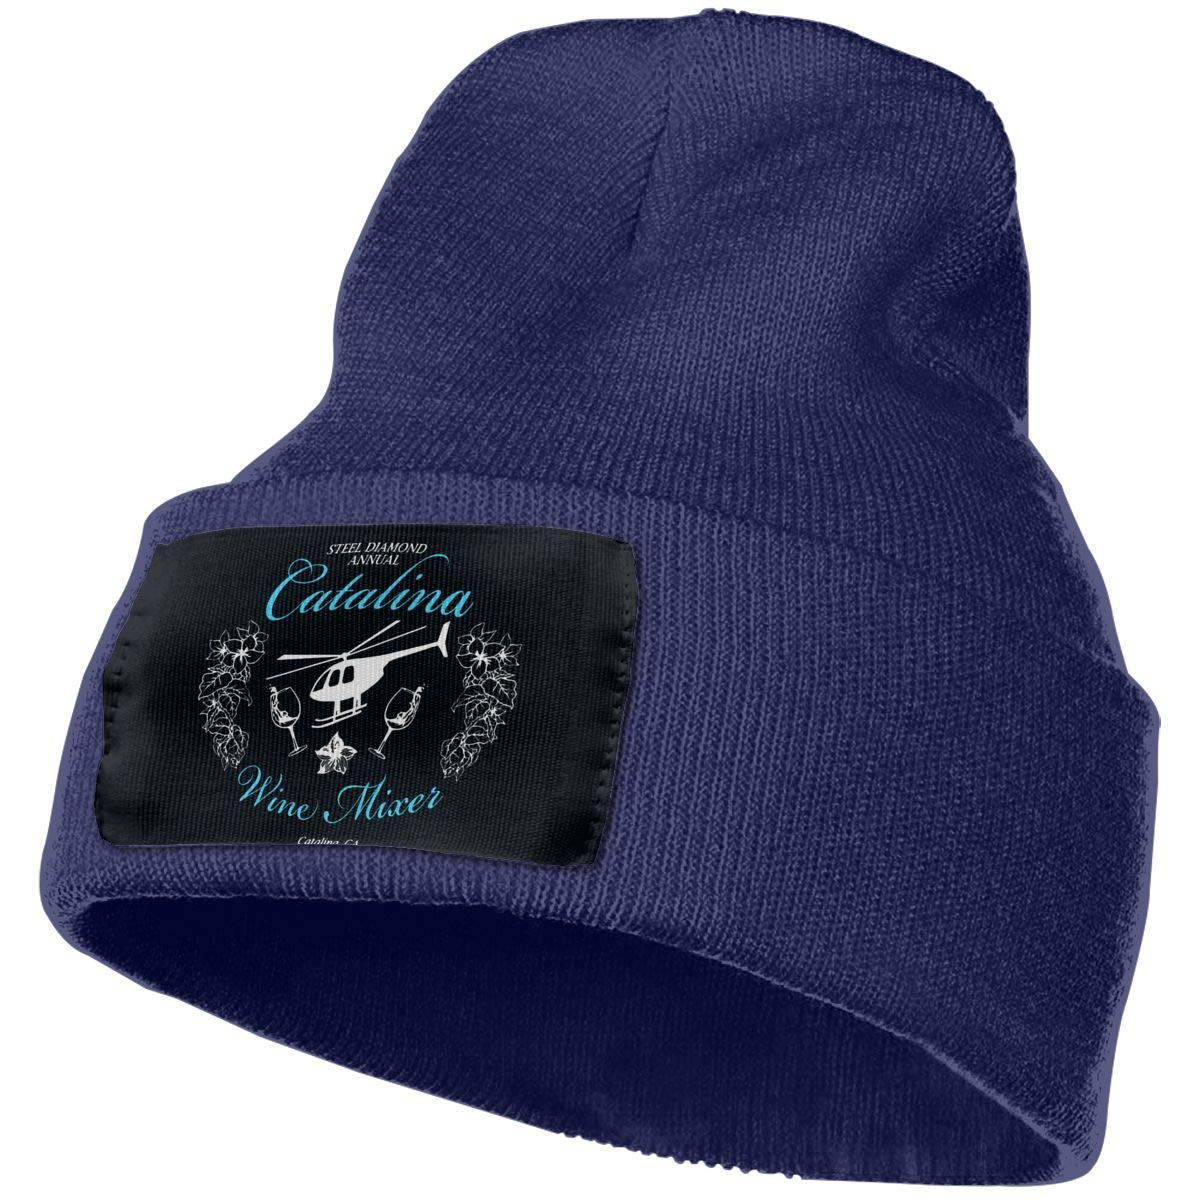 Catalina Annual Wine Mixer Winter Warm Hats,Knit Slouchy Thick Skull Cap Black